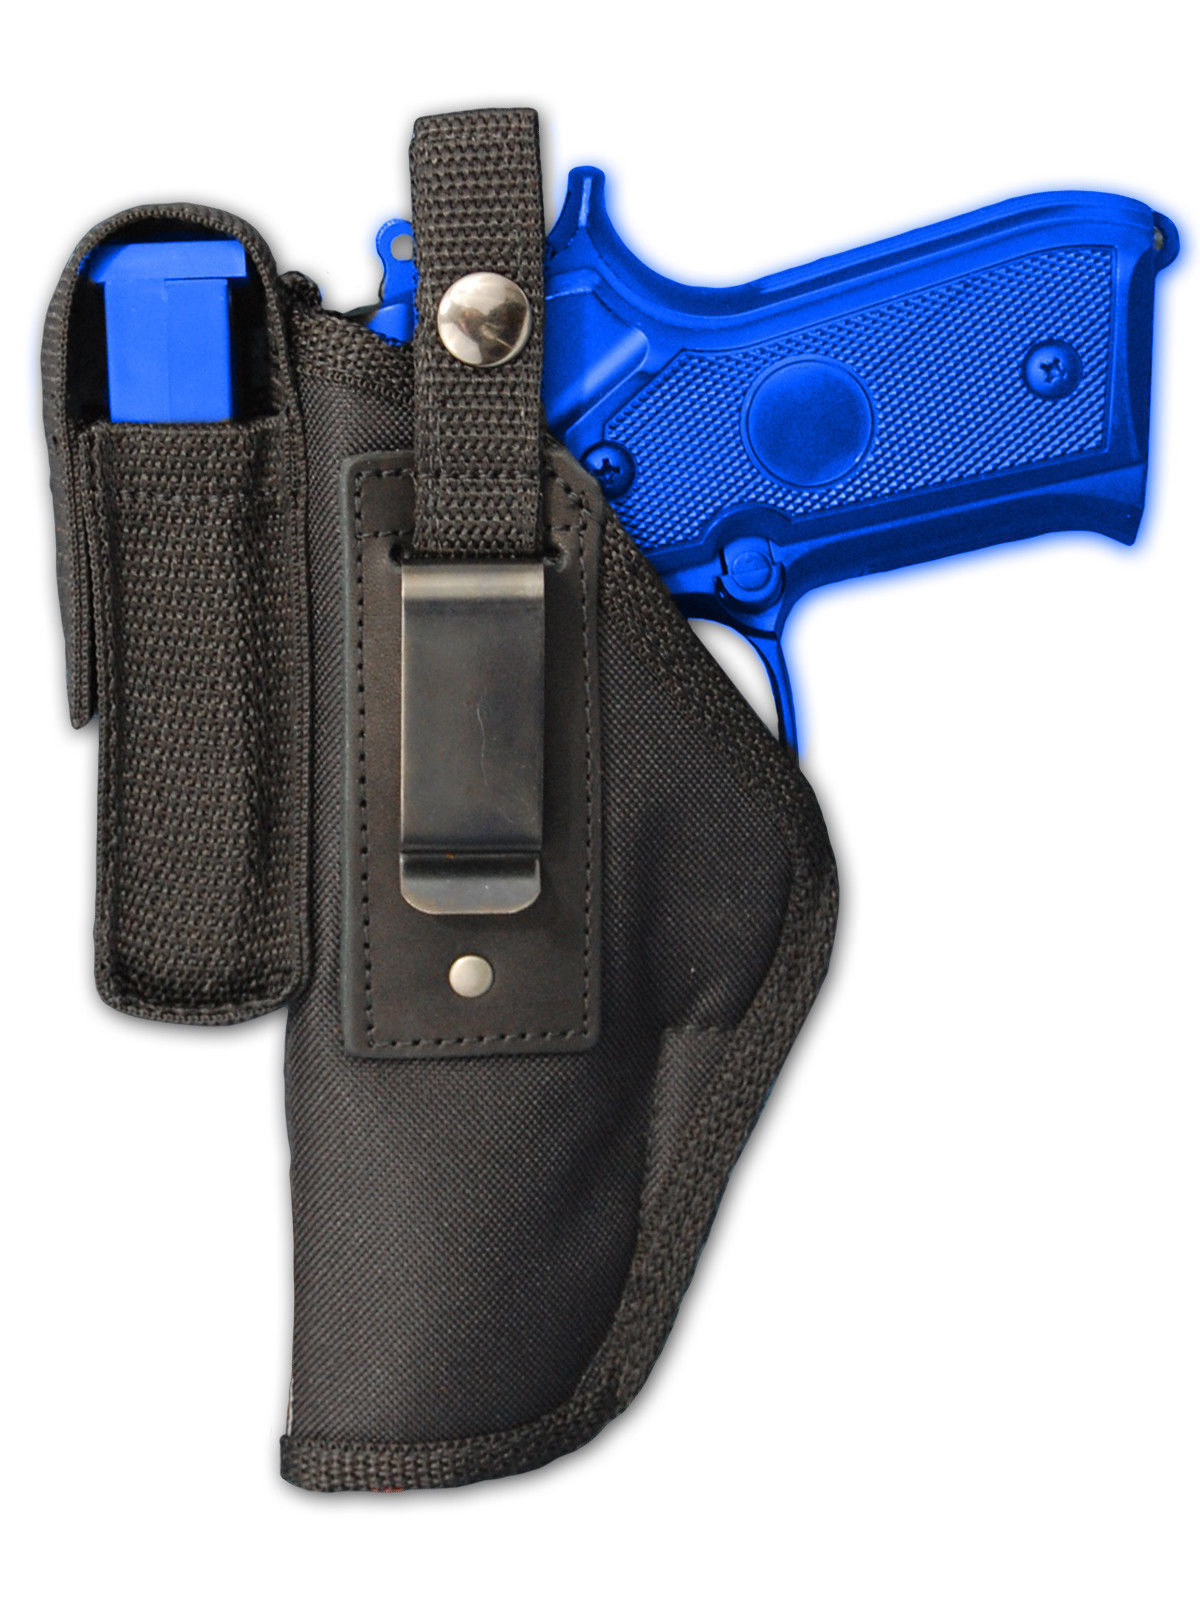 magazine clip holders for guns - HD1200×1600